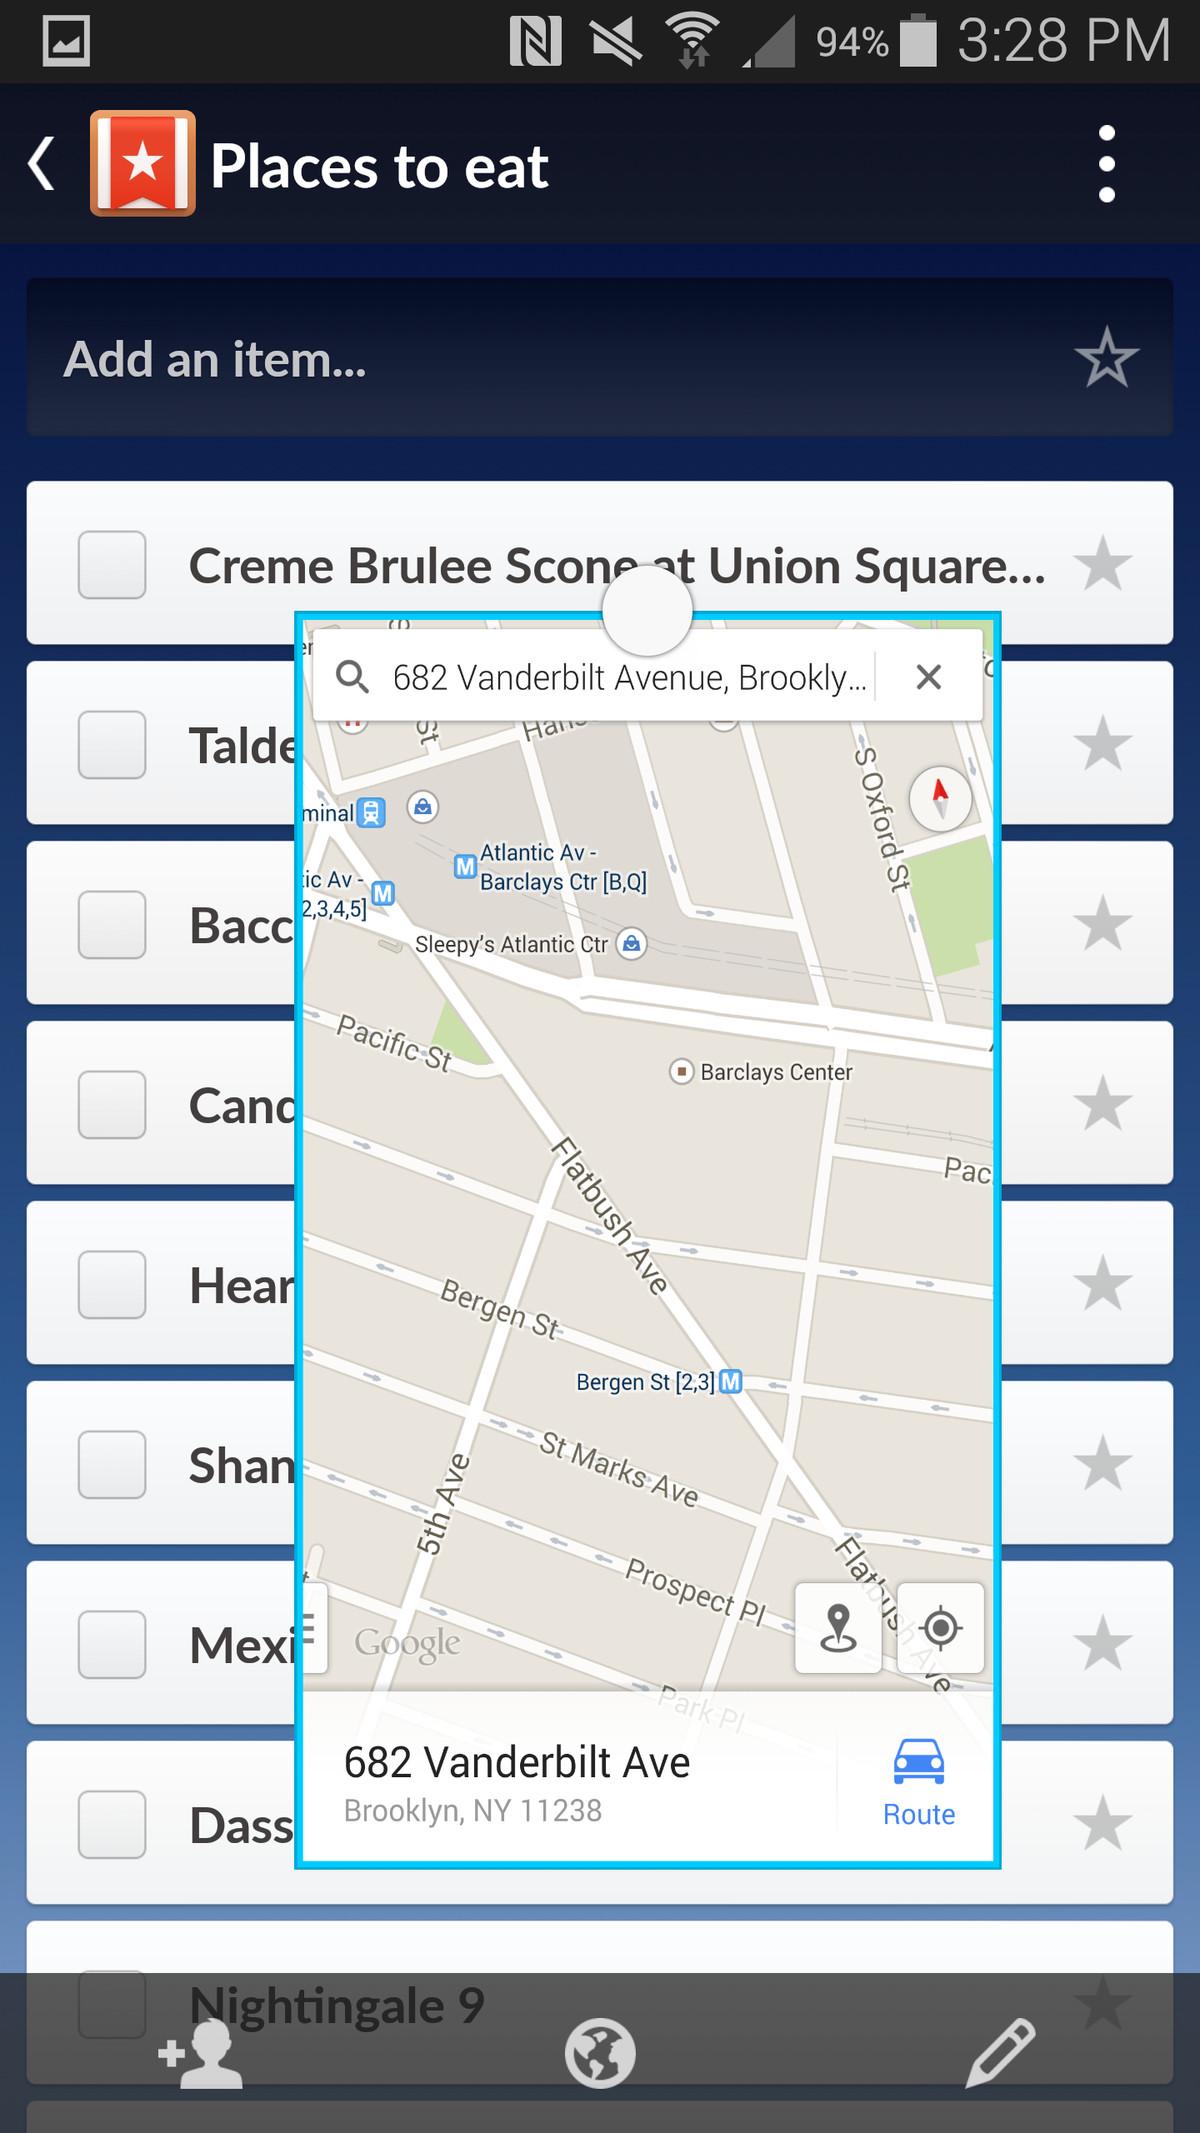 Samsung Galaxy Note 4 screenshot